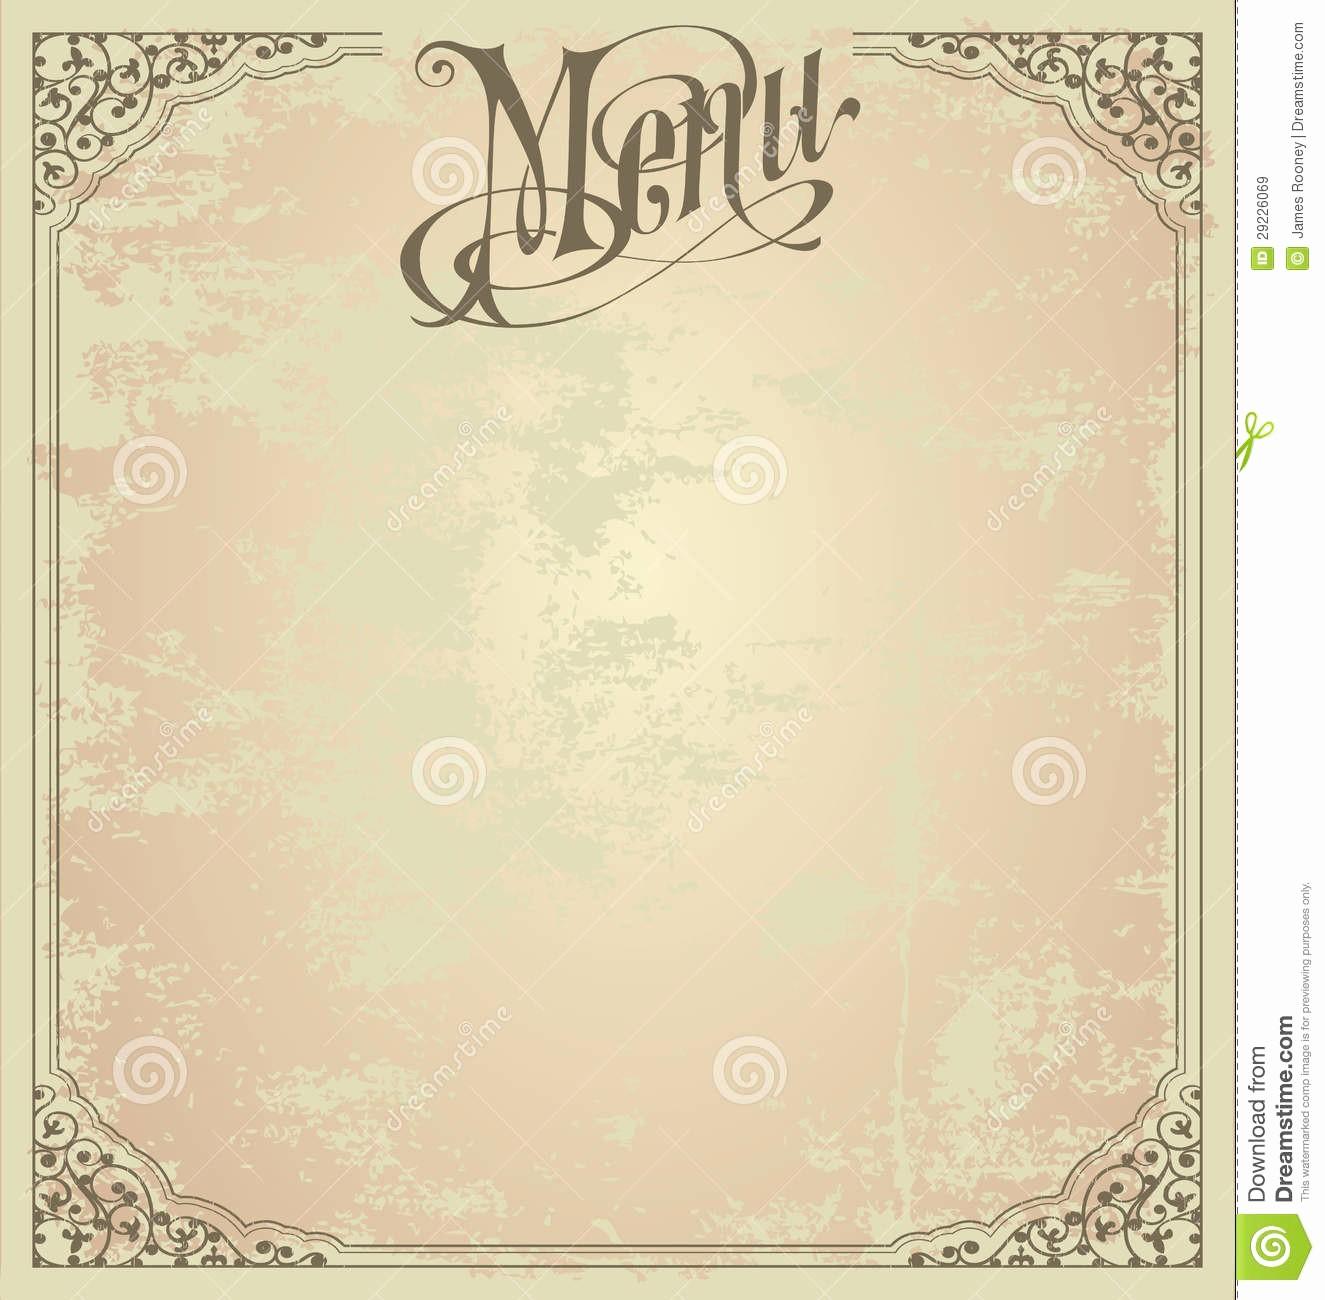 Free Printable Restaurant Menu Templates New Blank Menu Design Templates